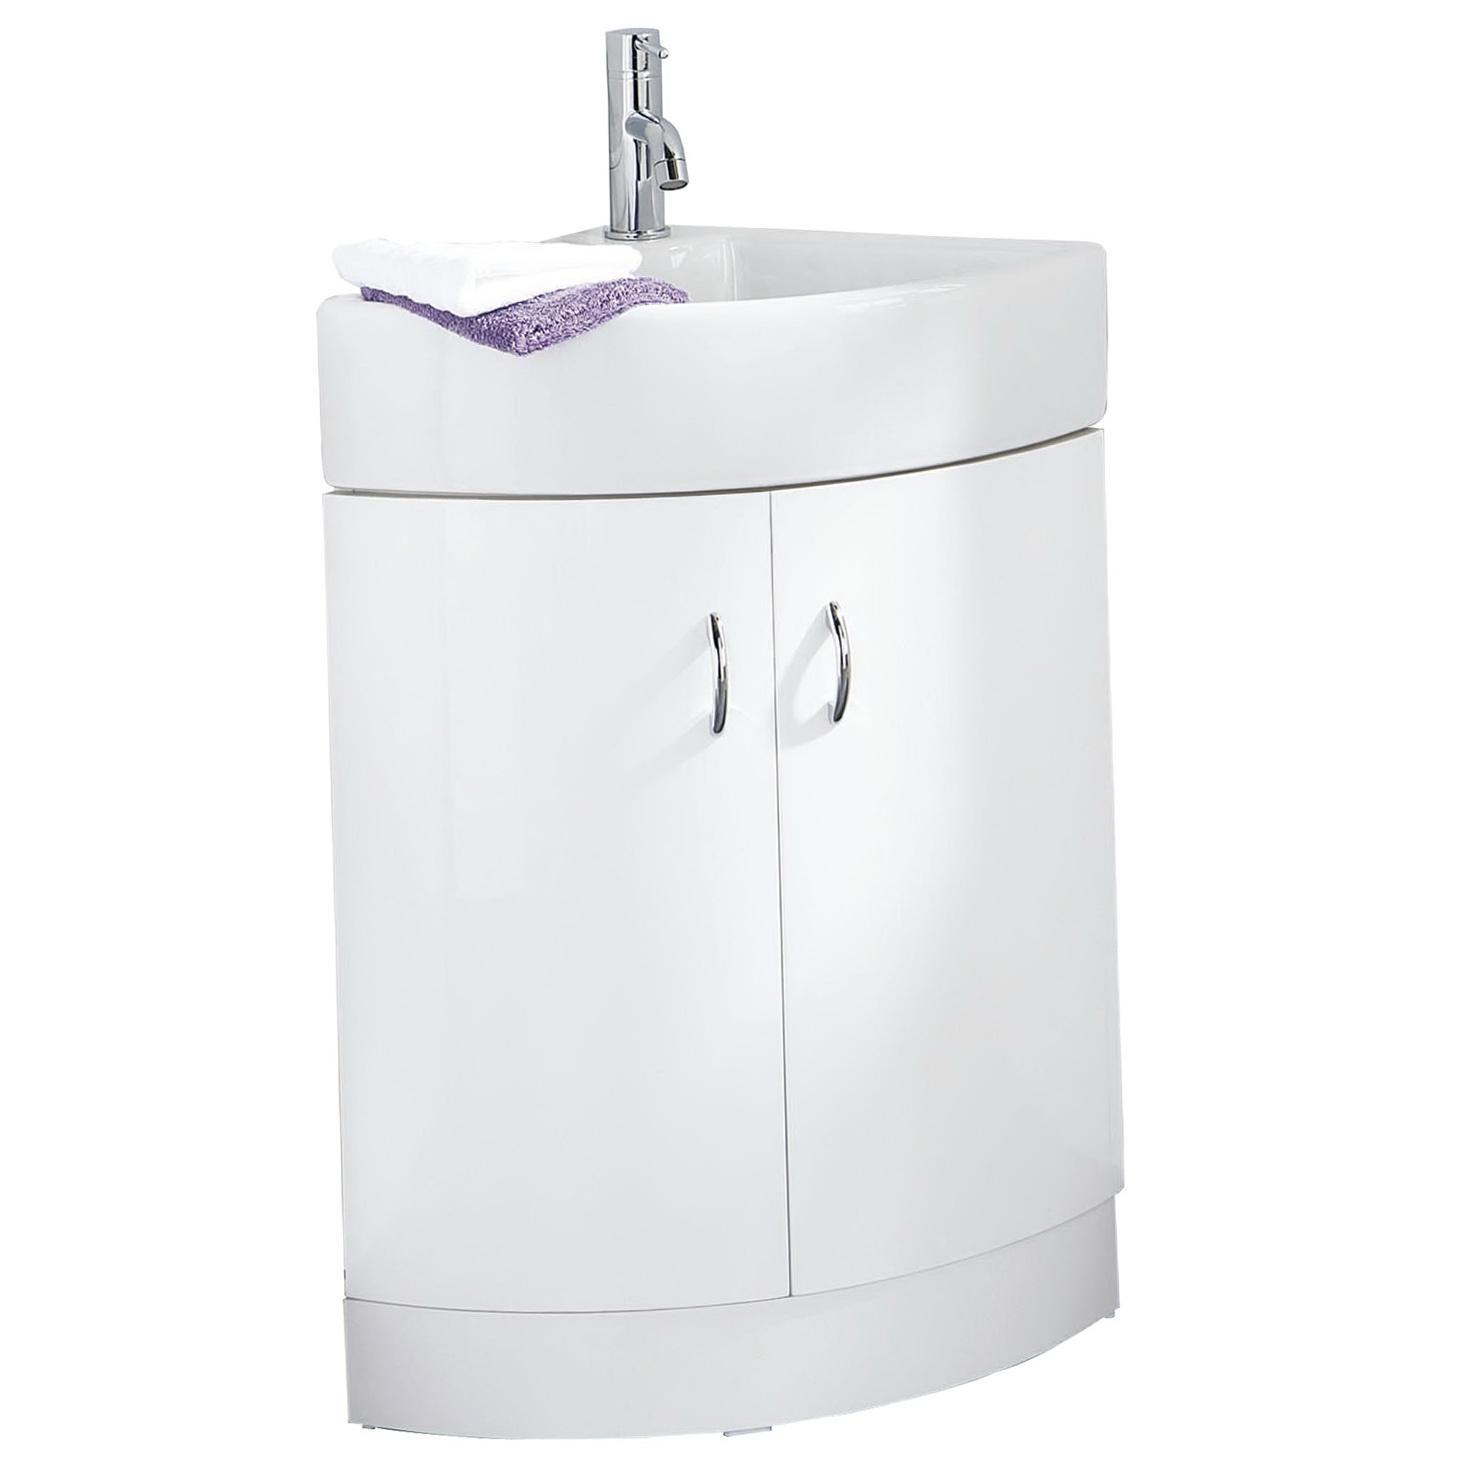 Corner Bathroom Vanity Dimensions: Small Bathroom Vanity Dimensions